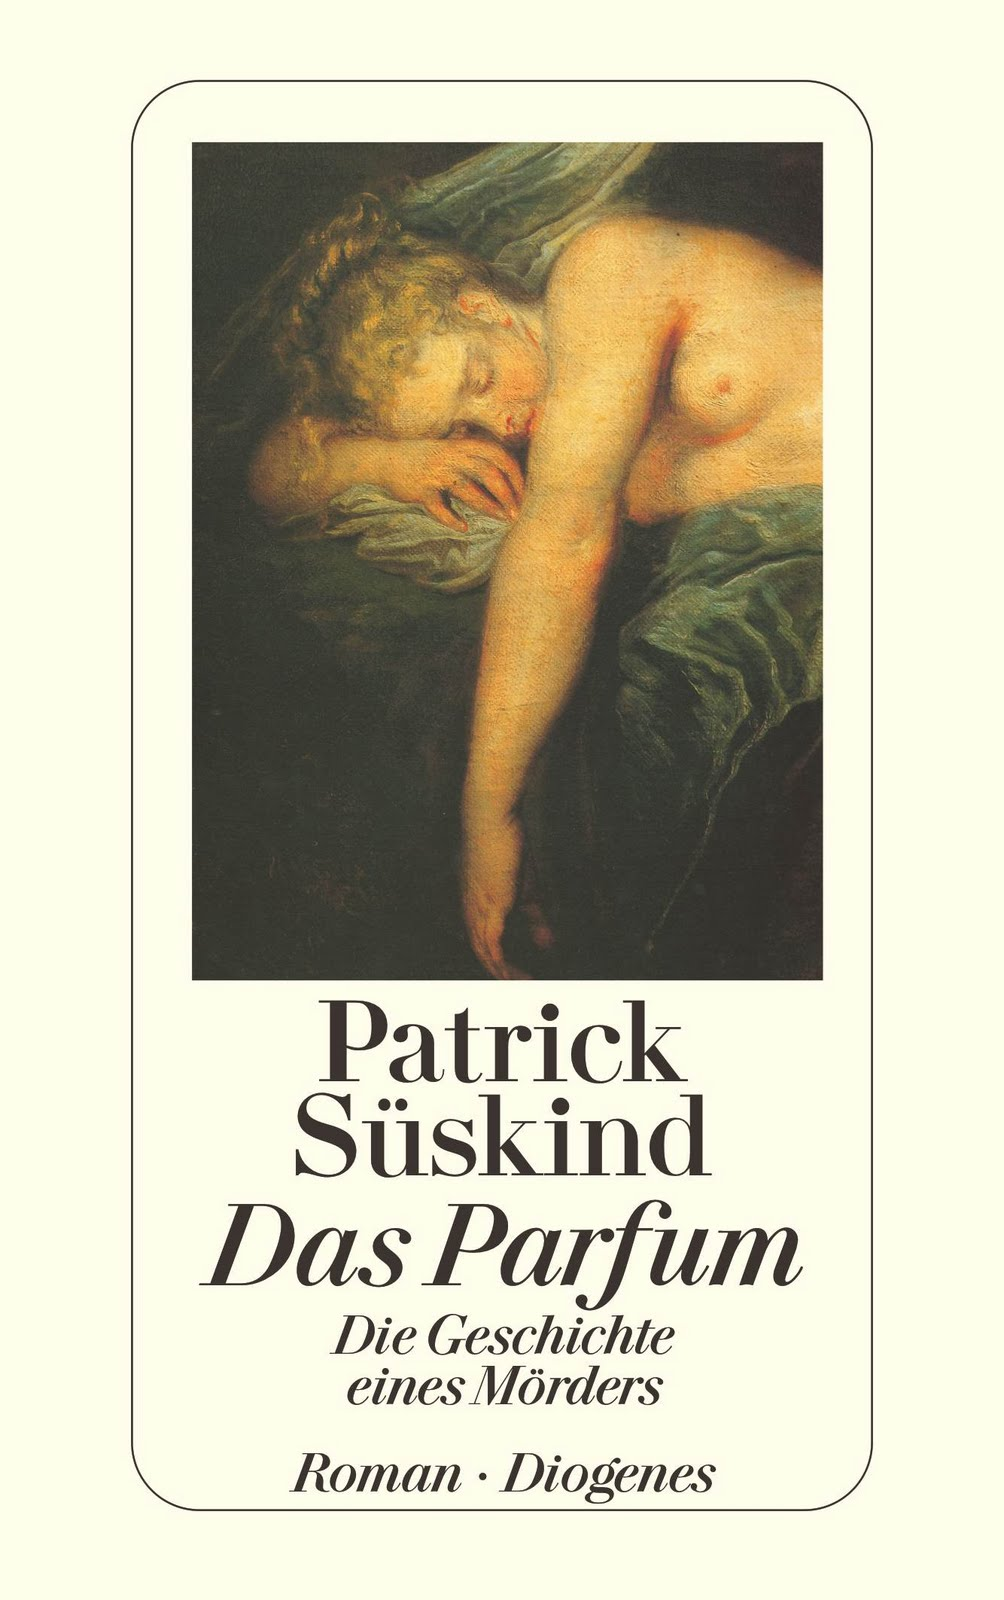 http://rukkola.hu/system/hd_covers/000/027/347/original/S%C3%BCskind__Patrick_-_Das_Parfum.jpg?1391287263